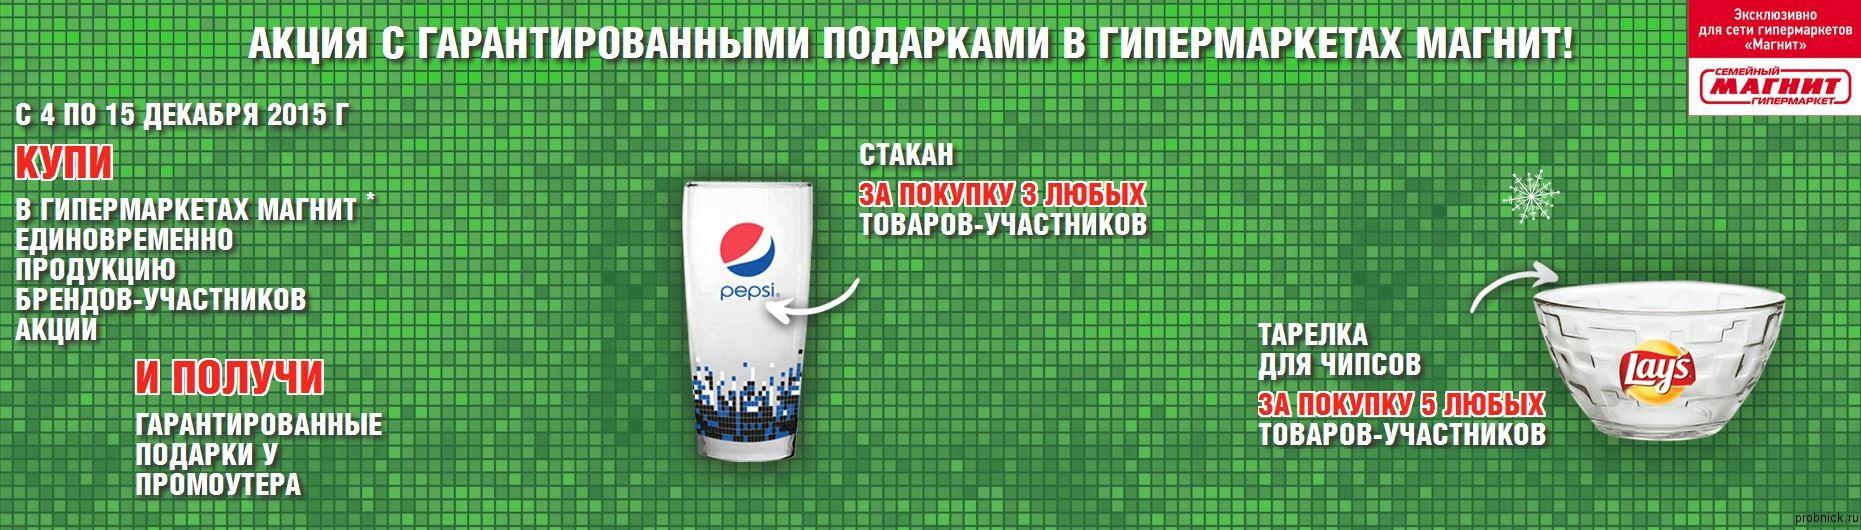 magnit_pepsi_dekabr